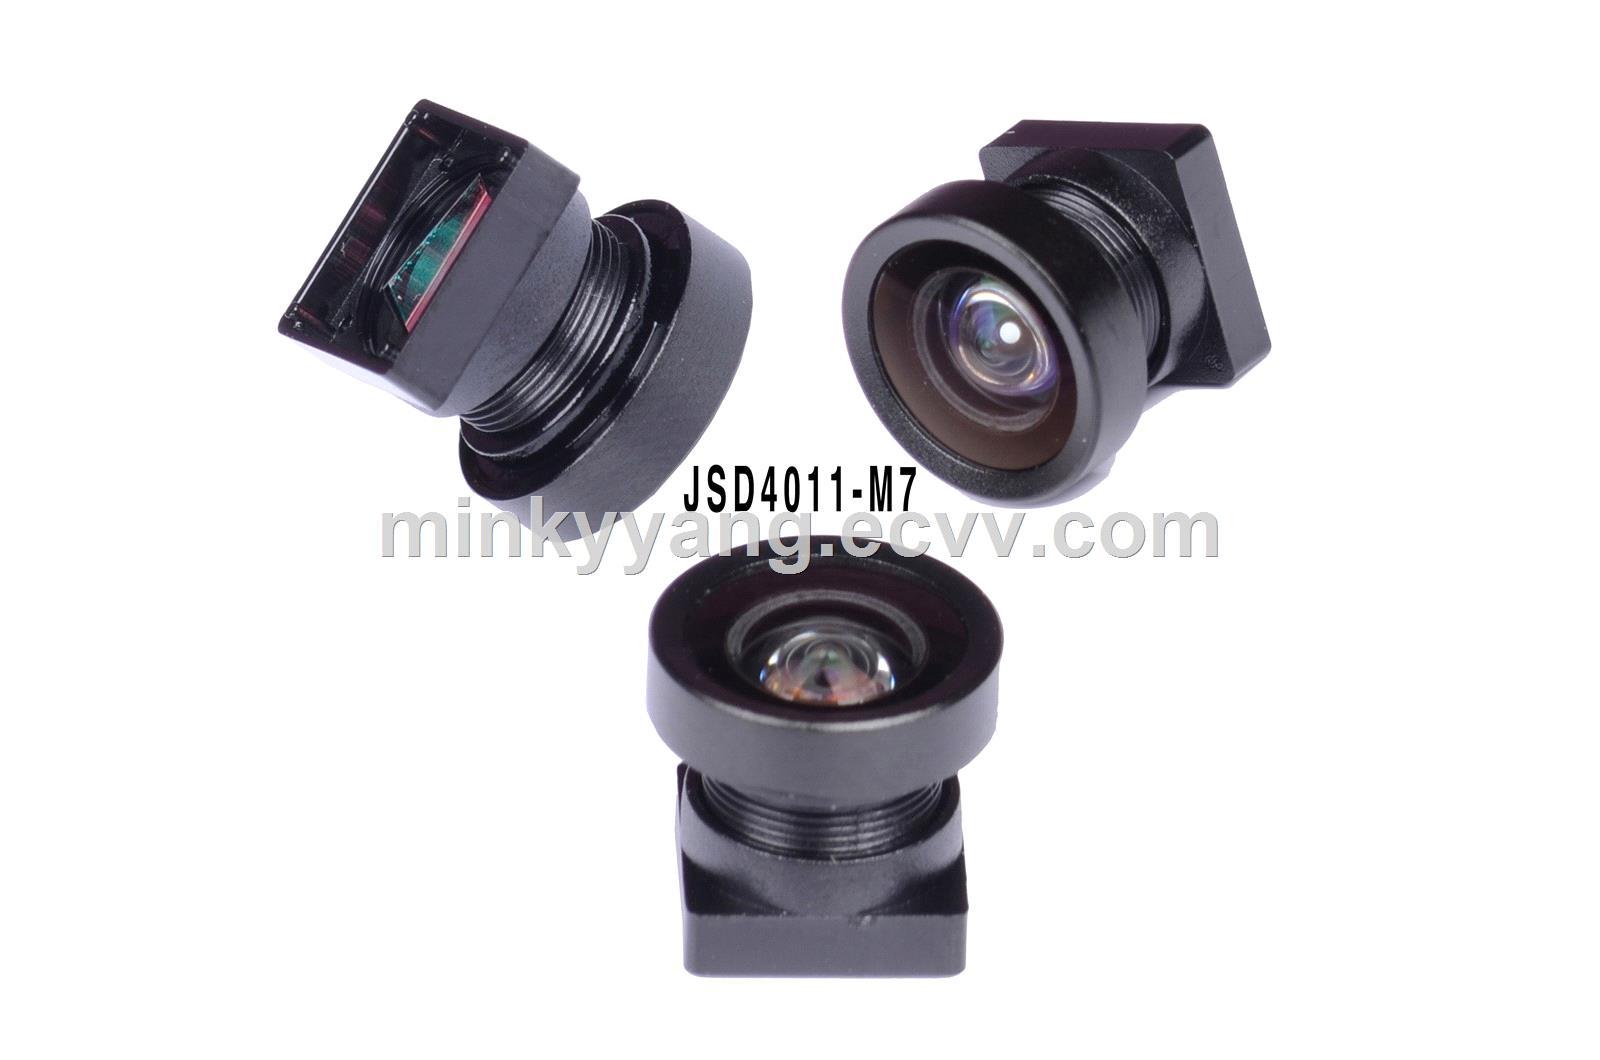 JSD4011 14 15 09mm m7 m8 m12 cctv camera lens for car rear view lens